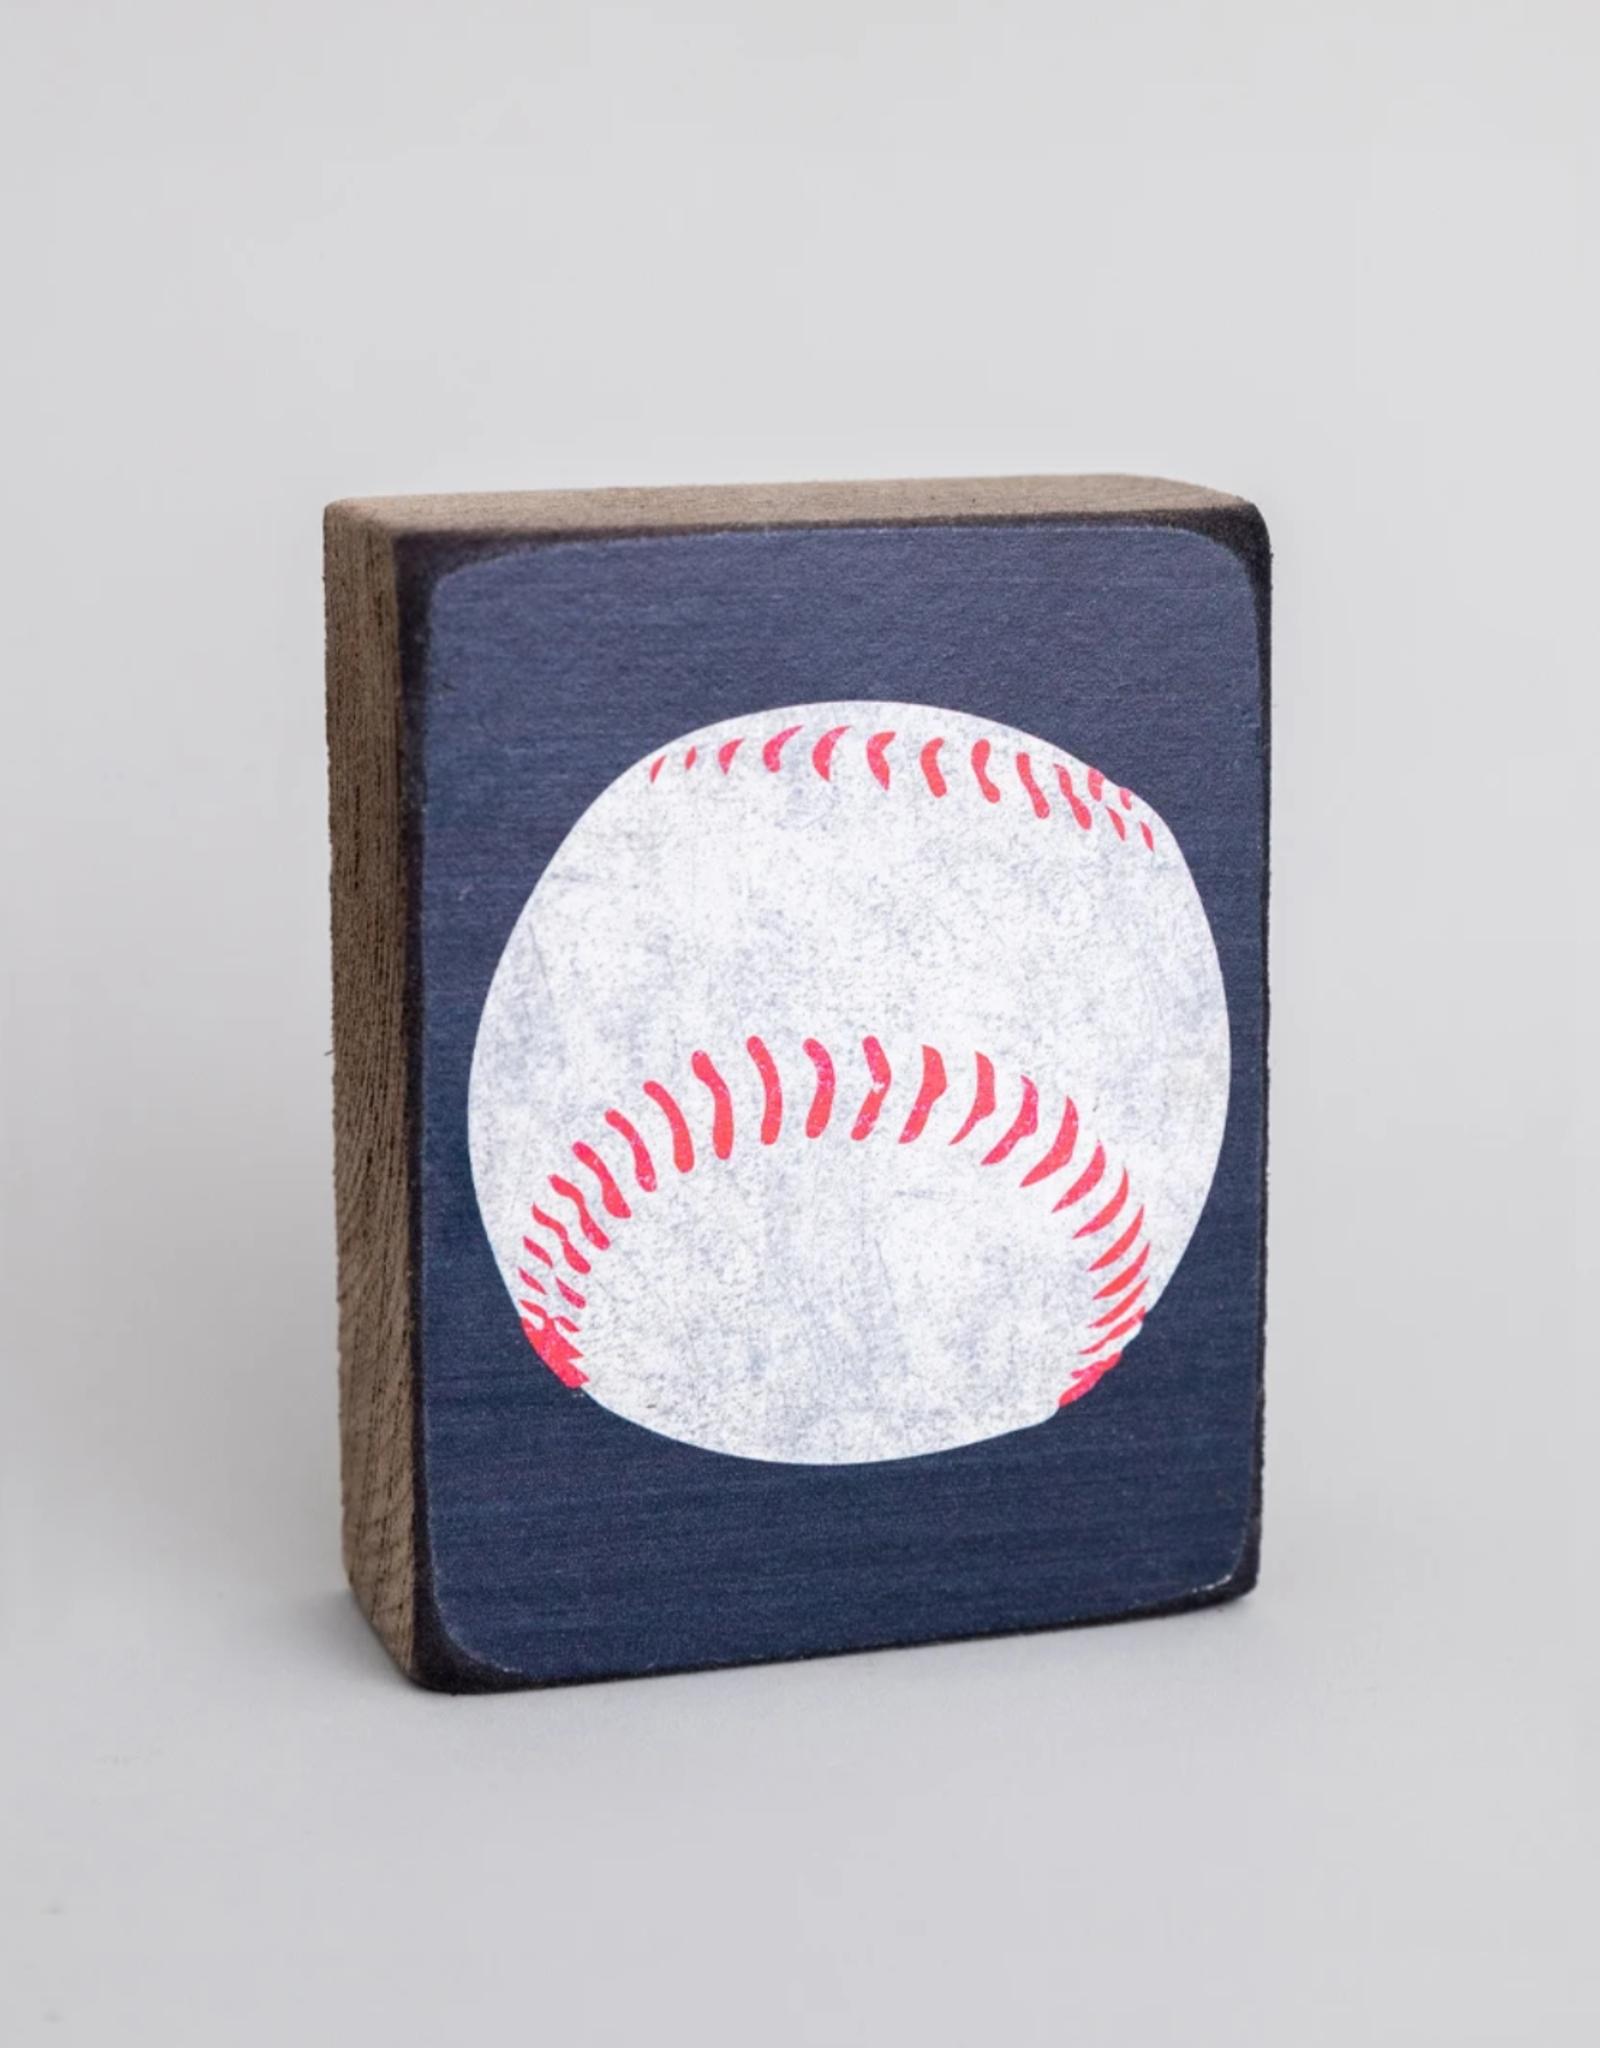 Rustic Marlin Rustic Marlin - Wood Block Baseball